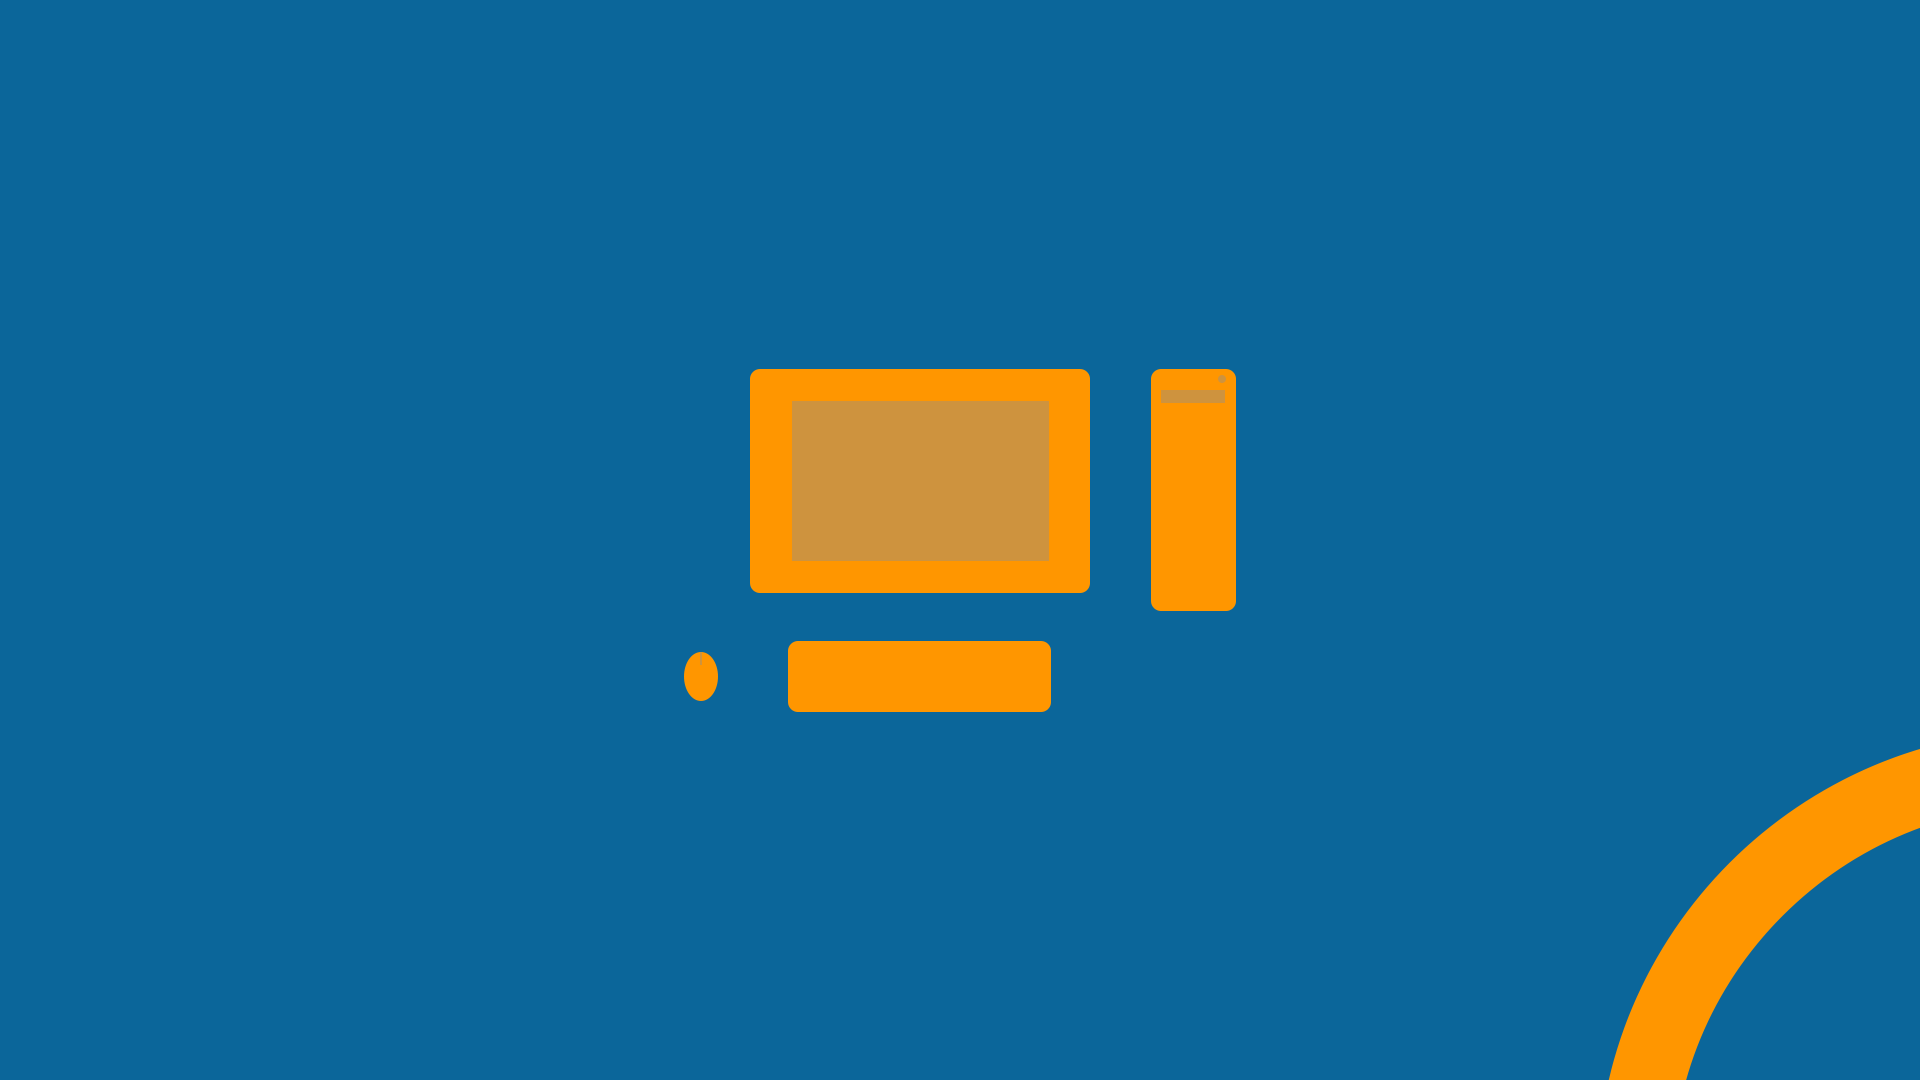 1080x1920 Daredevil Minimalism Iphone 7 6s 6 Plus Pixel: 1080x1920 Computer Minimalism Iphone 7,6s,6 Plus, Pixel Xl